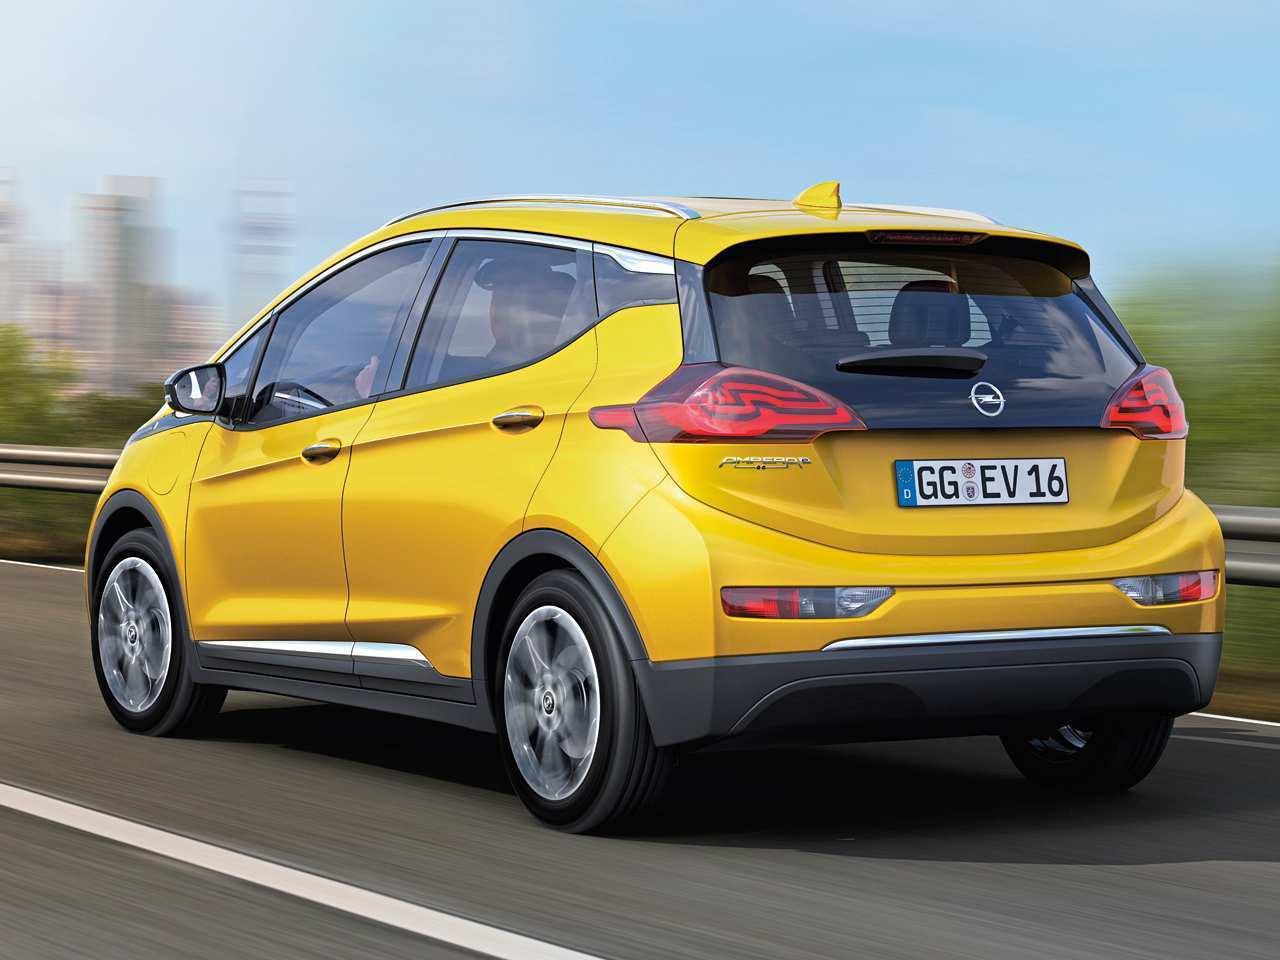 94 Great Opel Neuheiten 2020 Redesign and Concept with Opel Neuheiten 2020